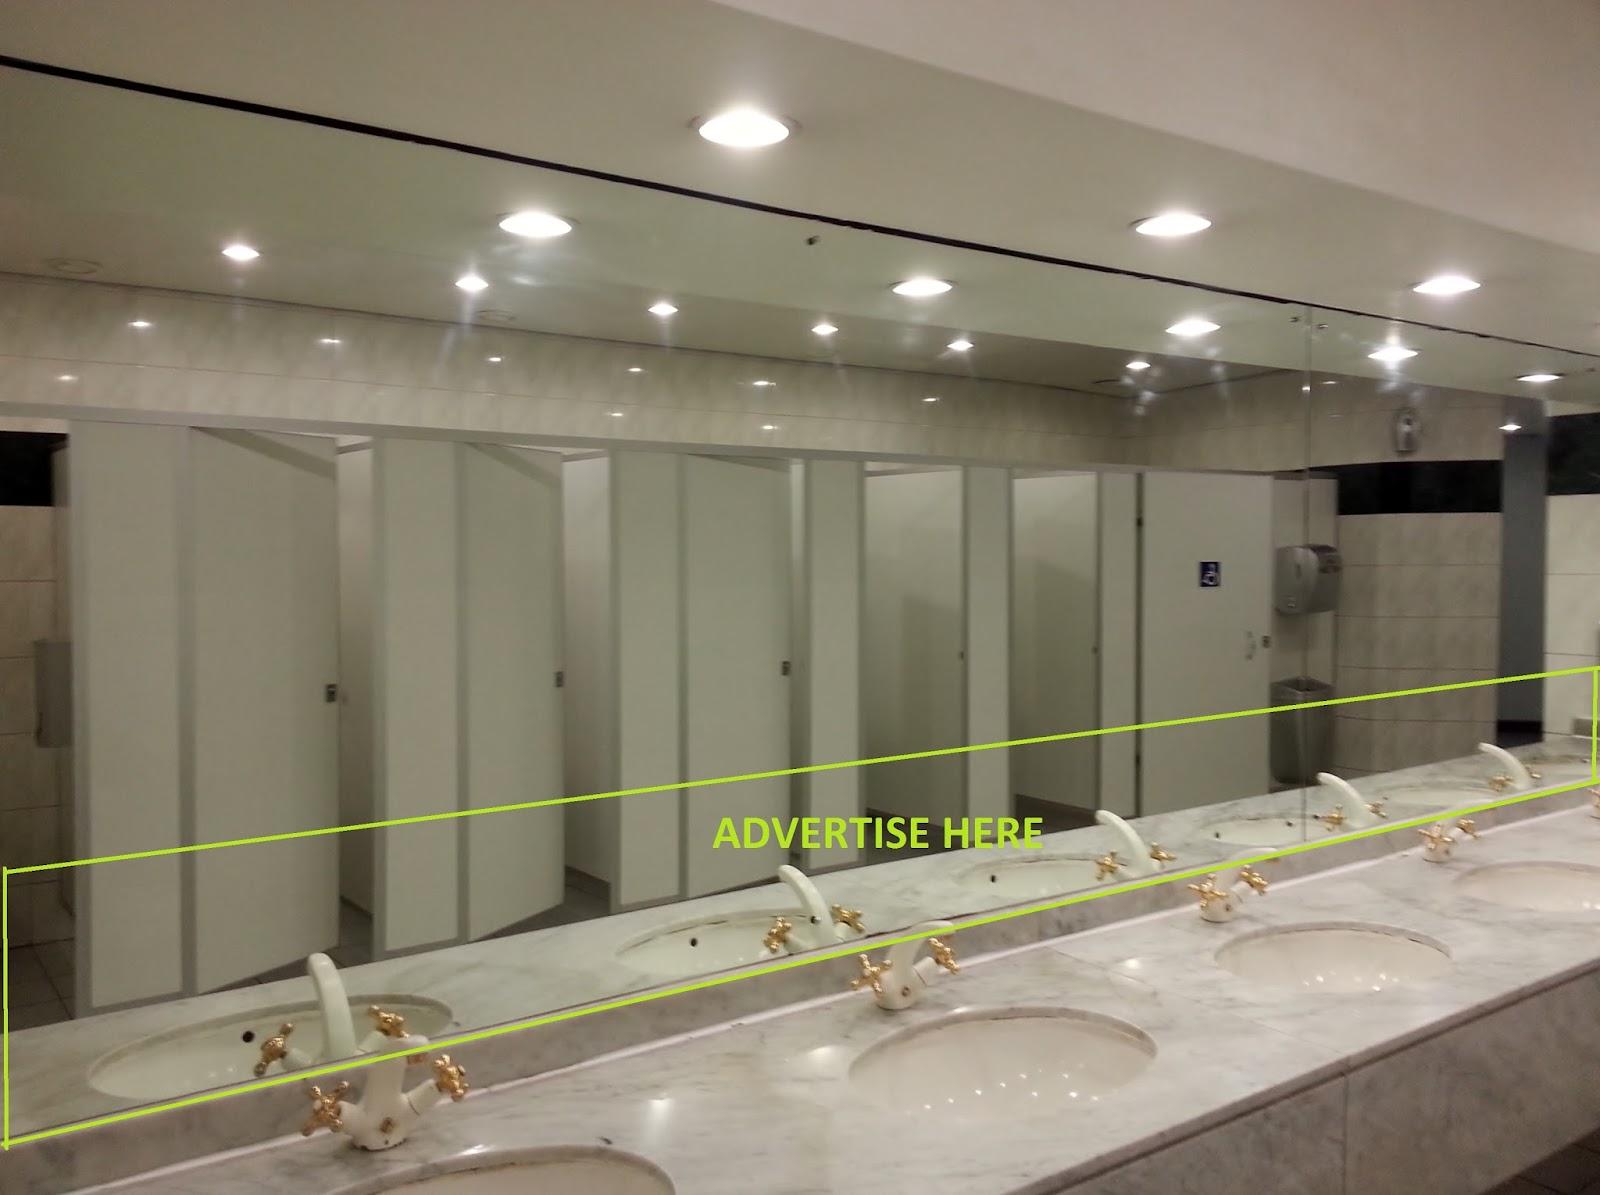 BathroomMirror01_Lower.jpg